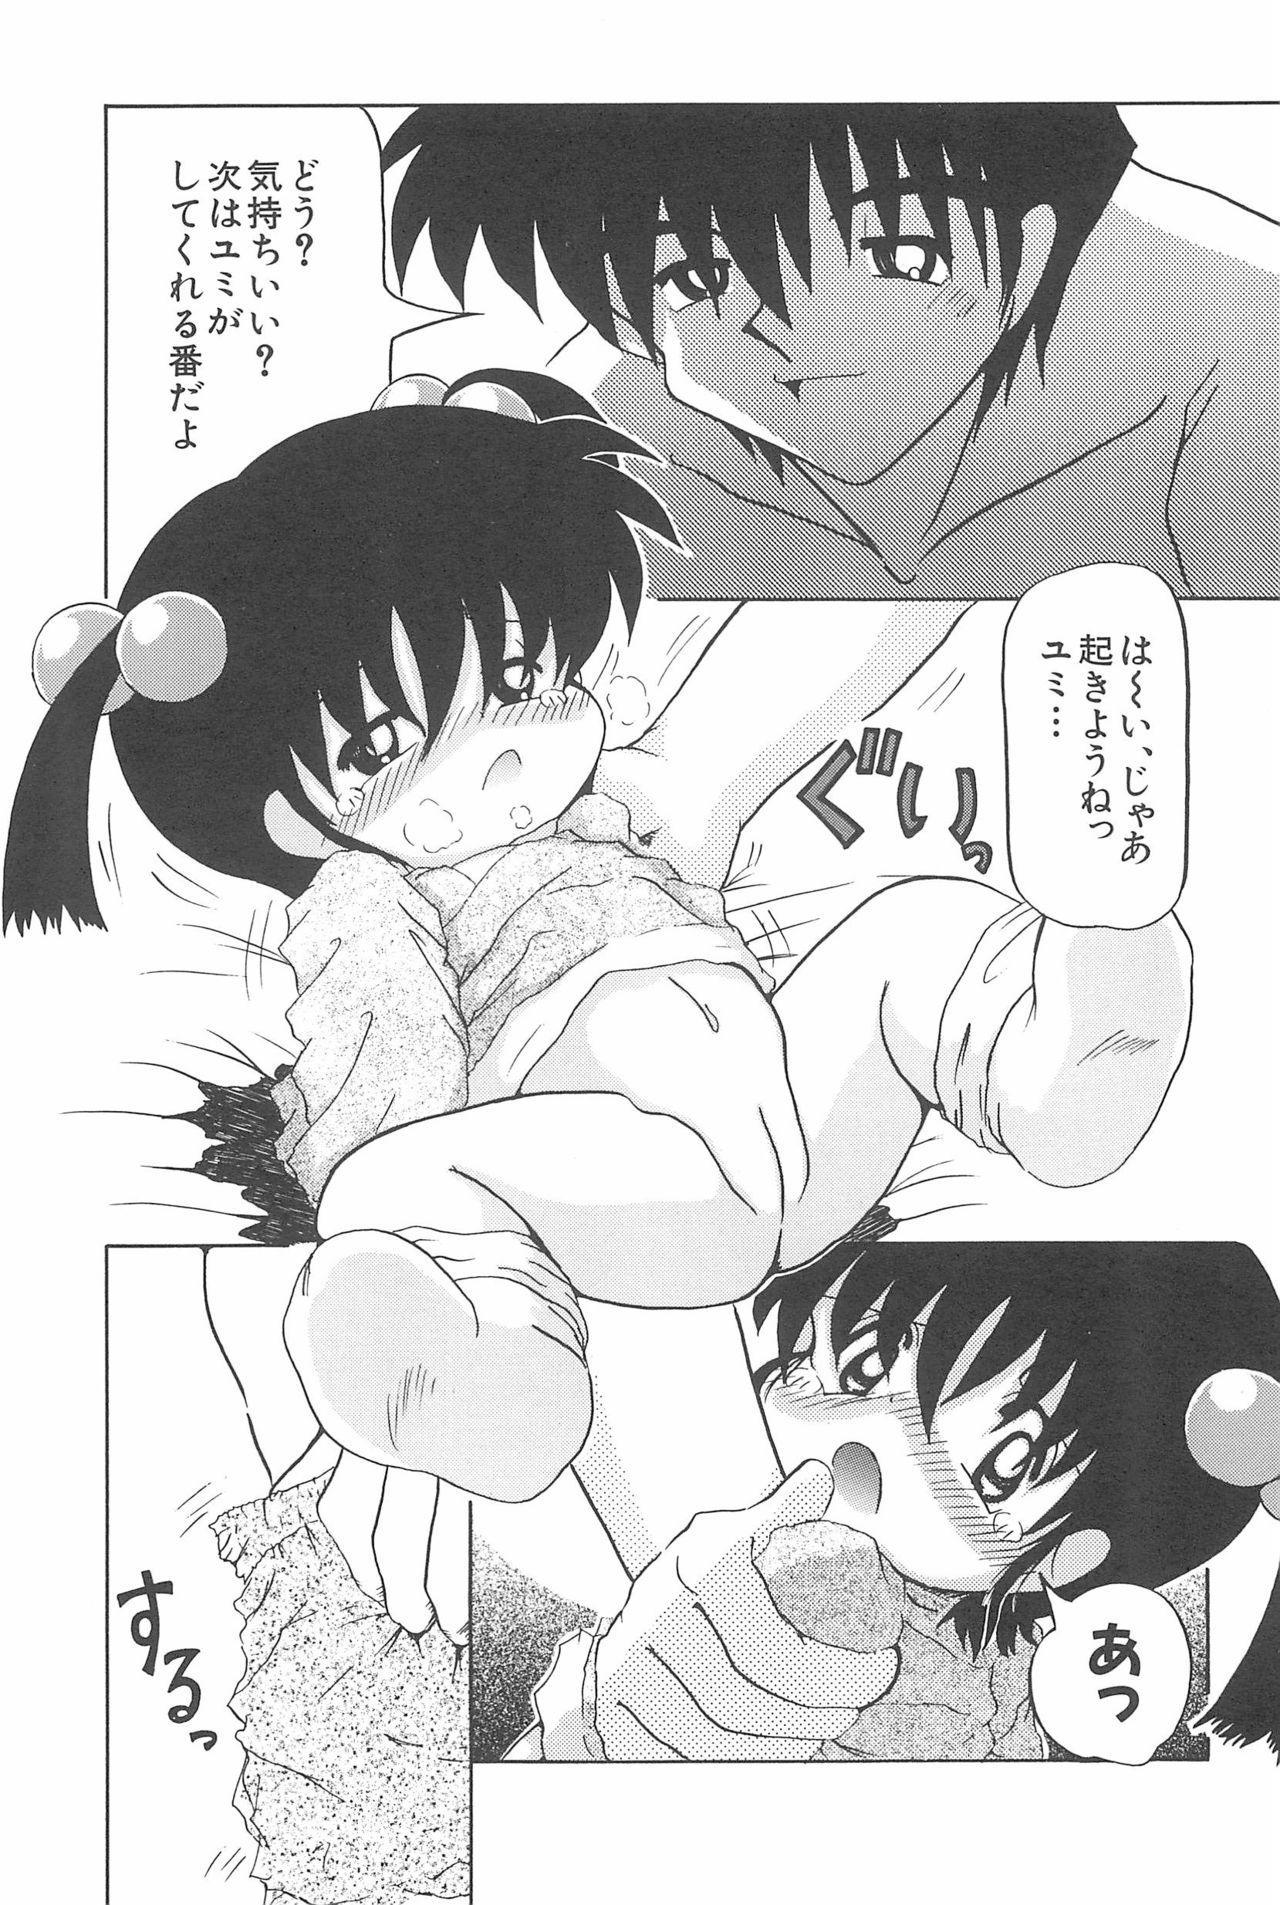 Aoi Shojokyuu 136